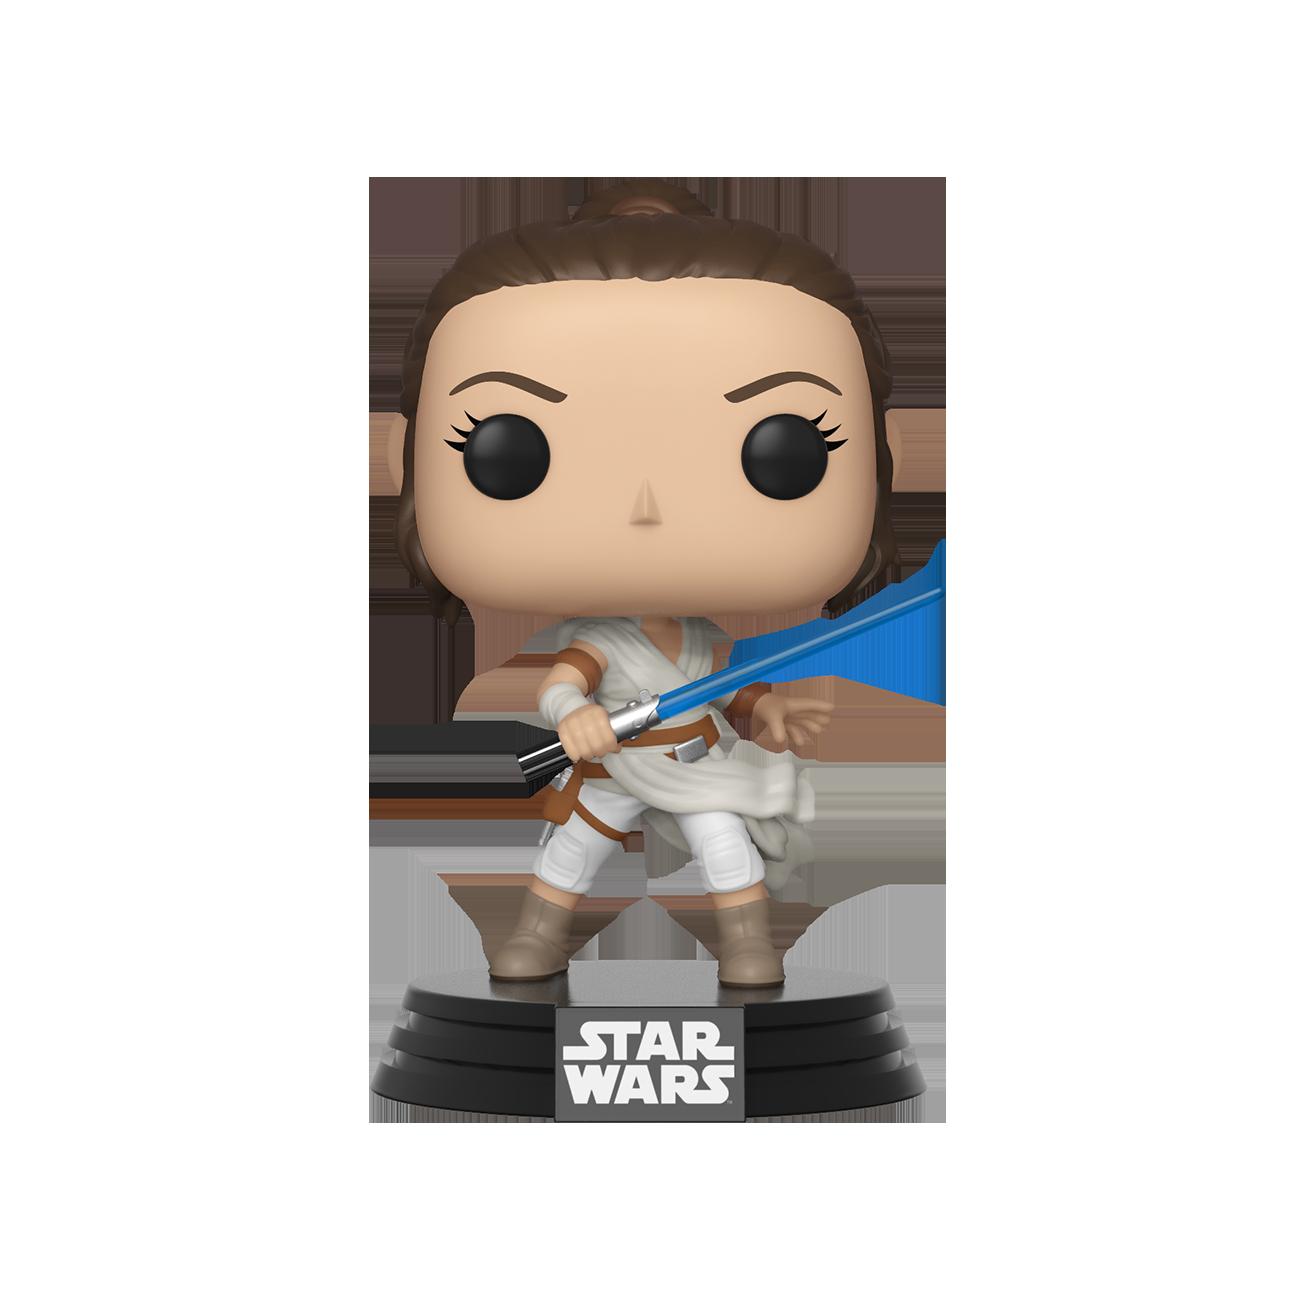 TROS FP Rey (Rey Skywalker) BH Toy 2